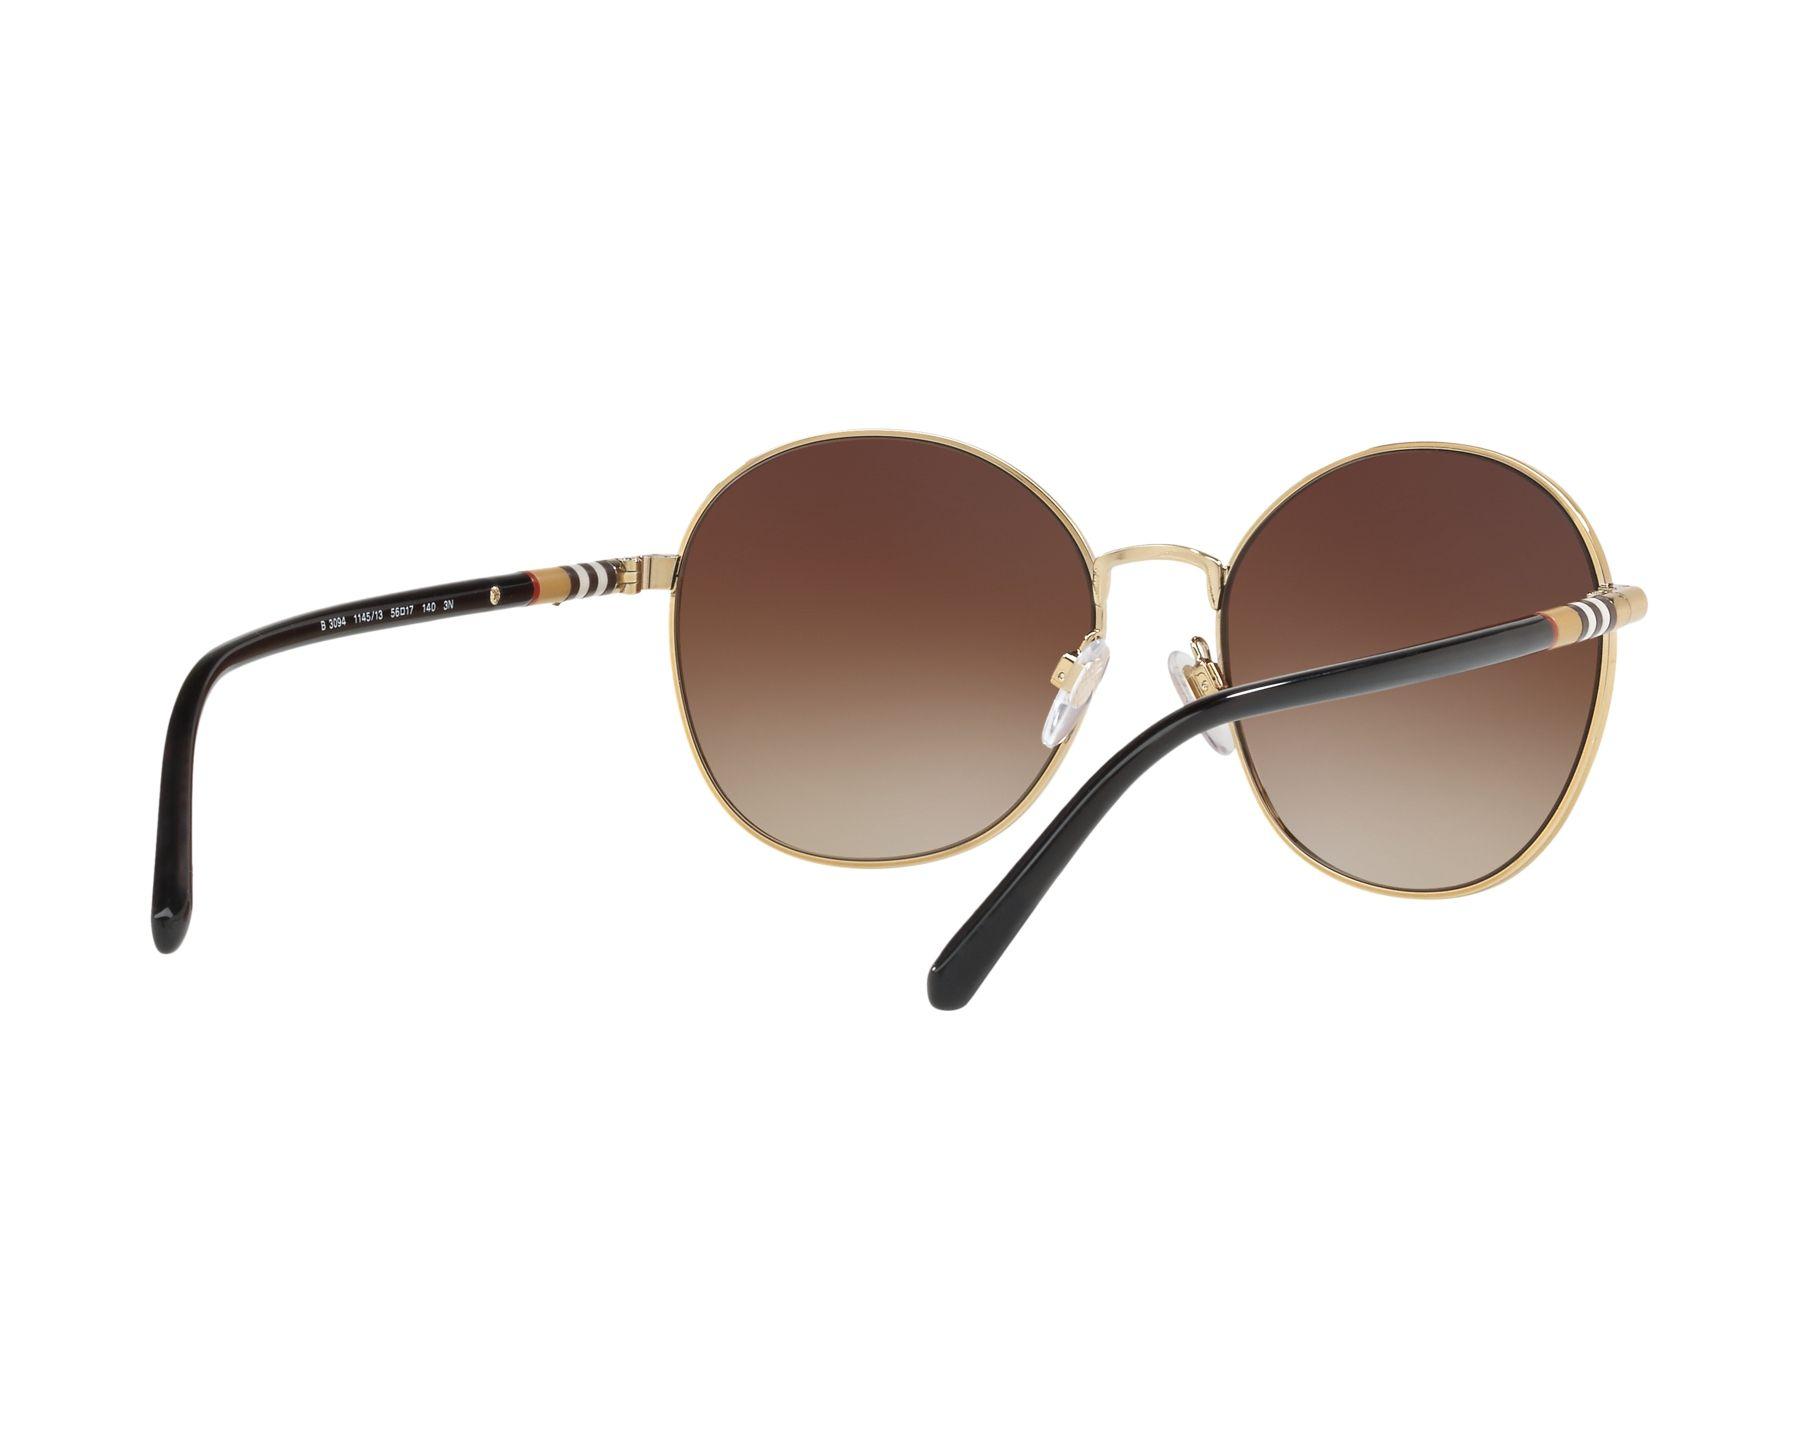 7c25ddf0c8a Sunglasses Burberry BE-3094 114513 56-17 Black Gold 360 degree view 8